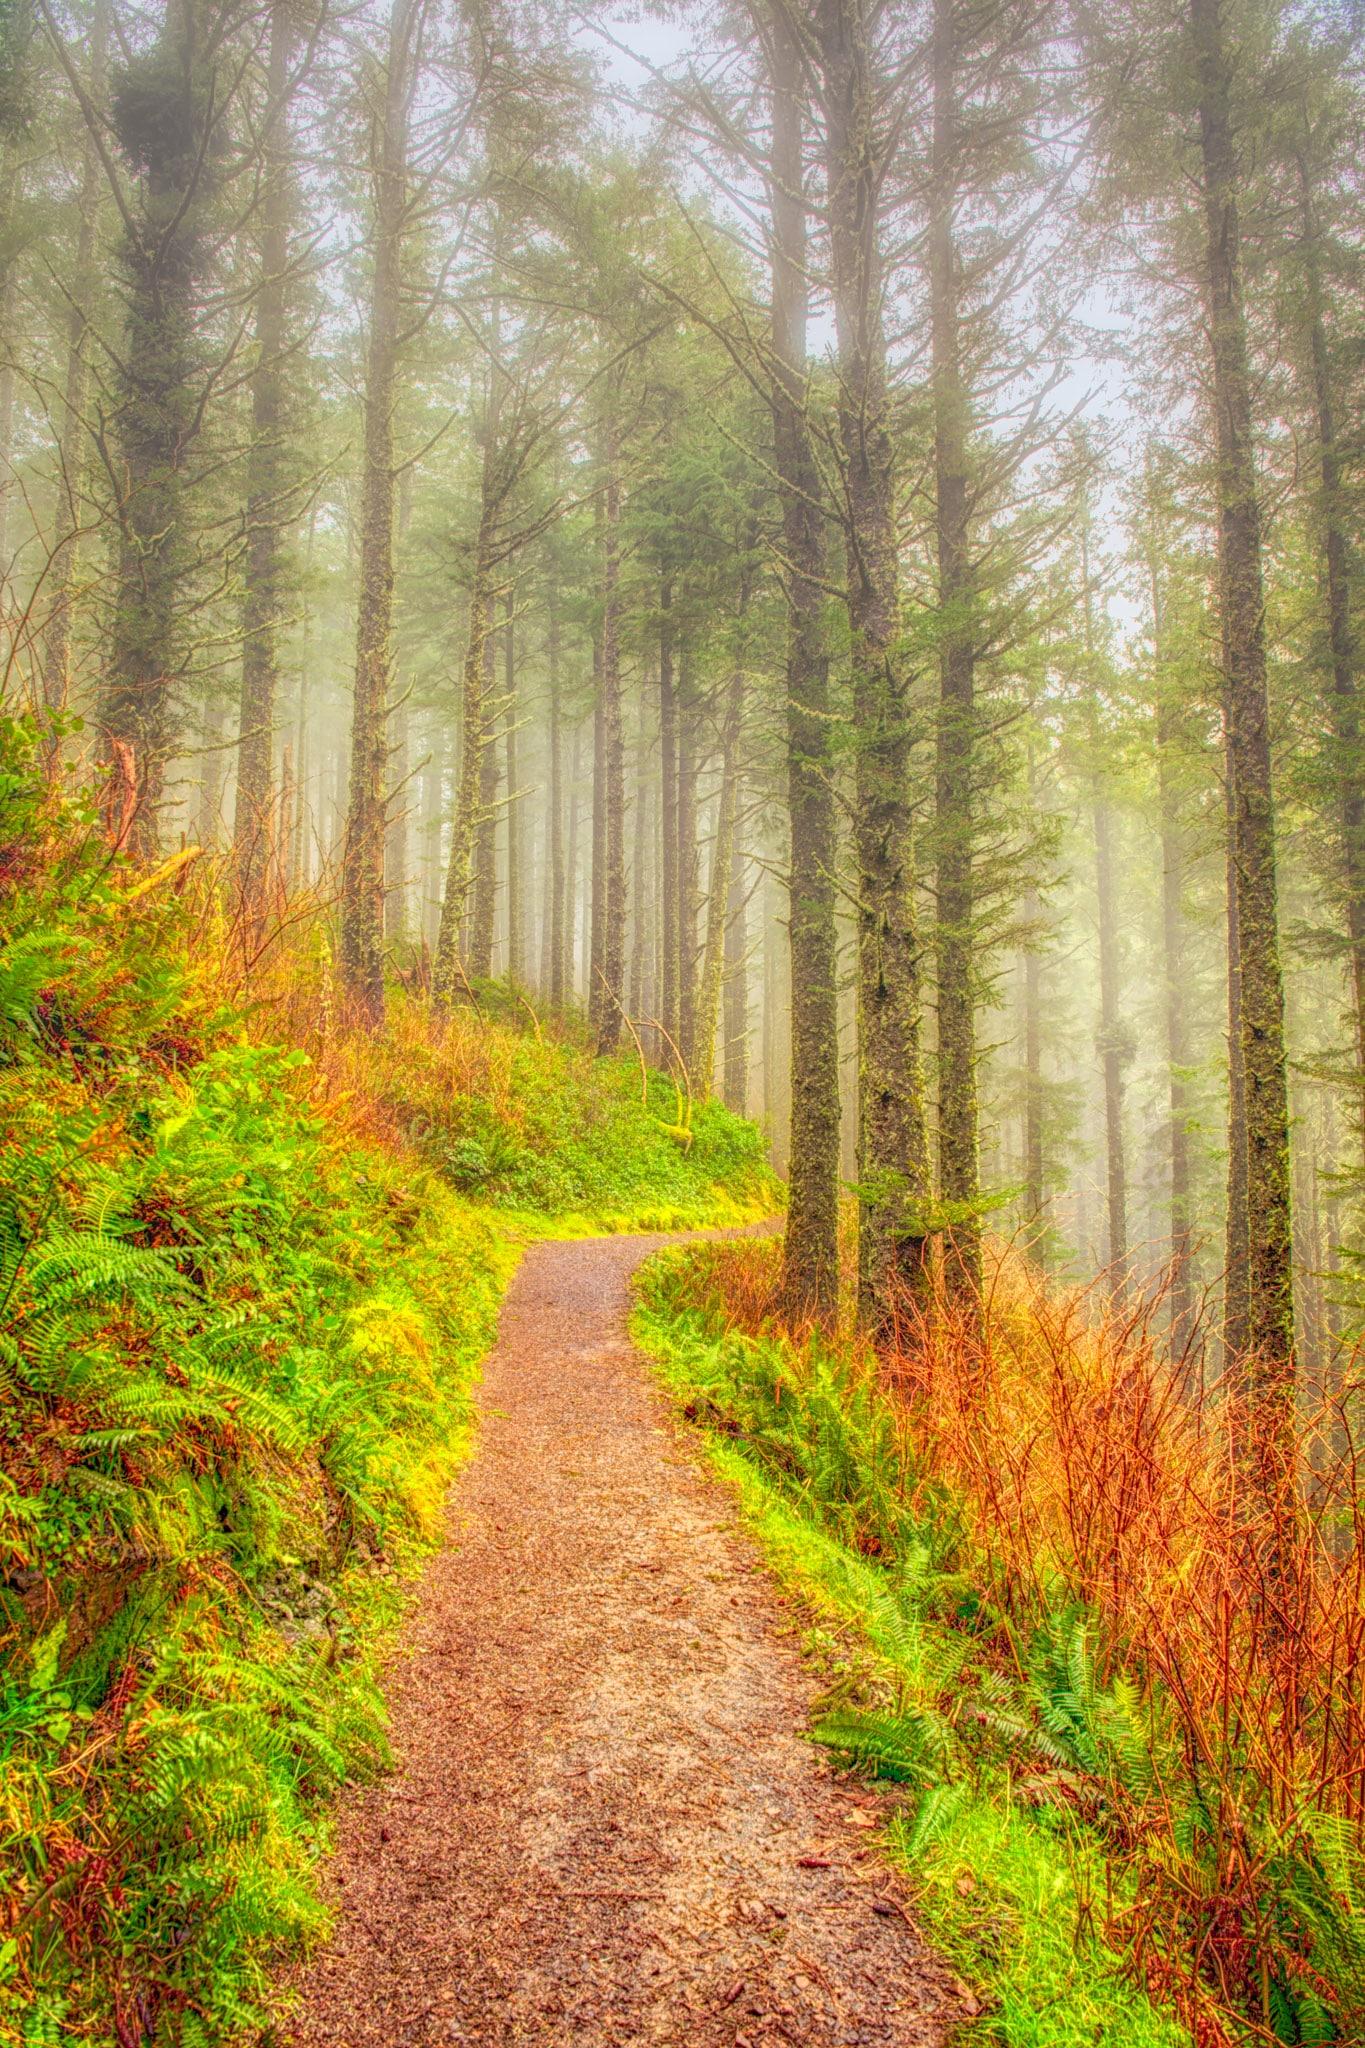 Cape Lookout Trail - Oregon's Pacific coast